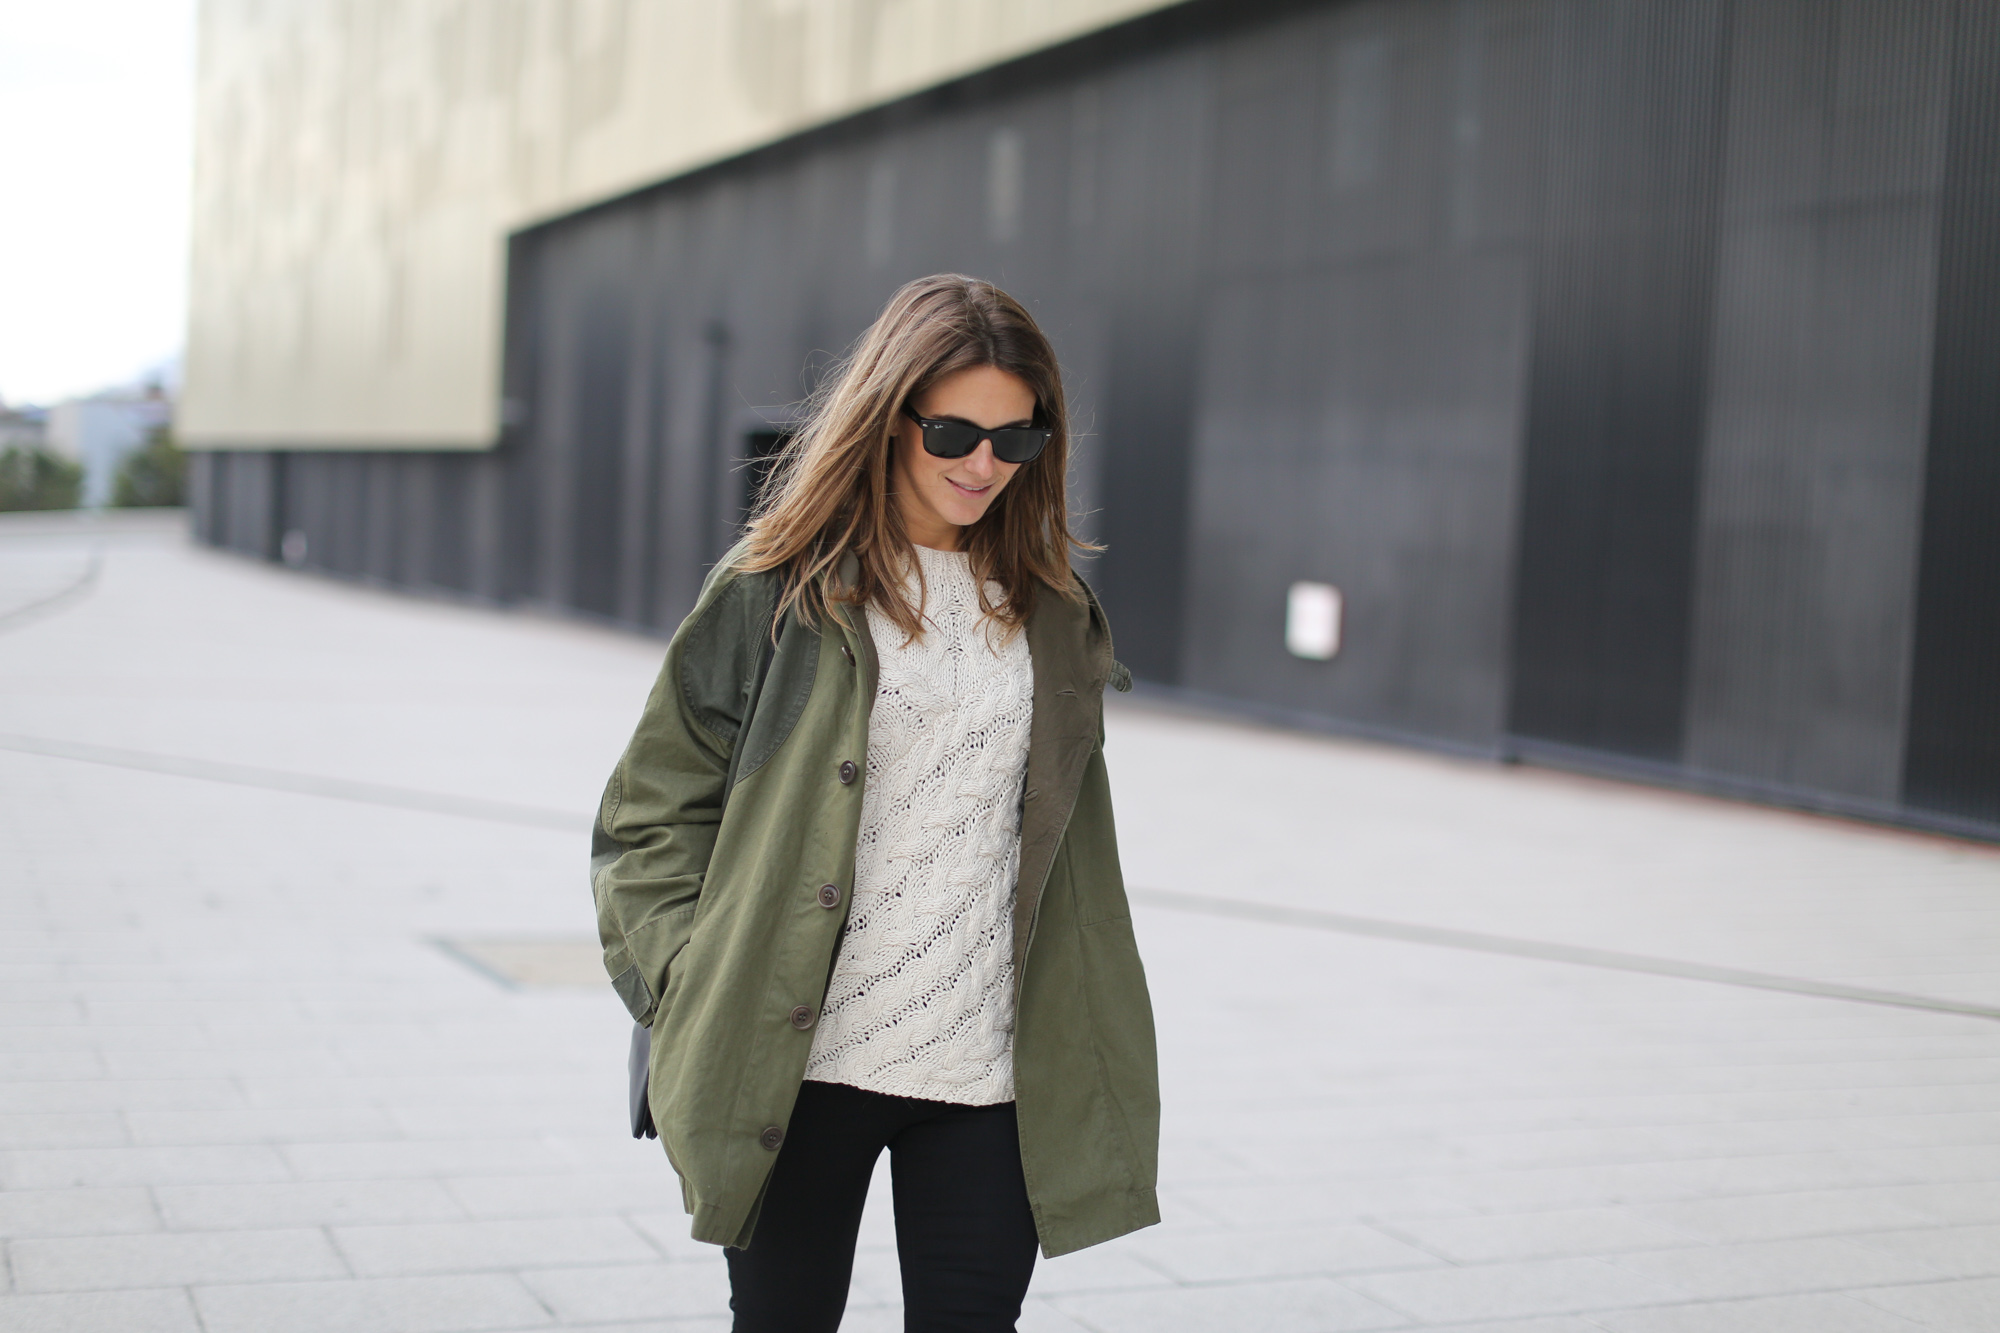 Clochet-streetstyle-isabel-marant-ellison-parka-h&m-trend-shirt-8